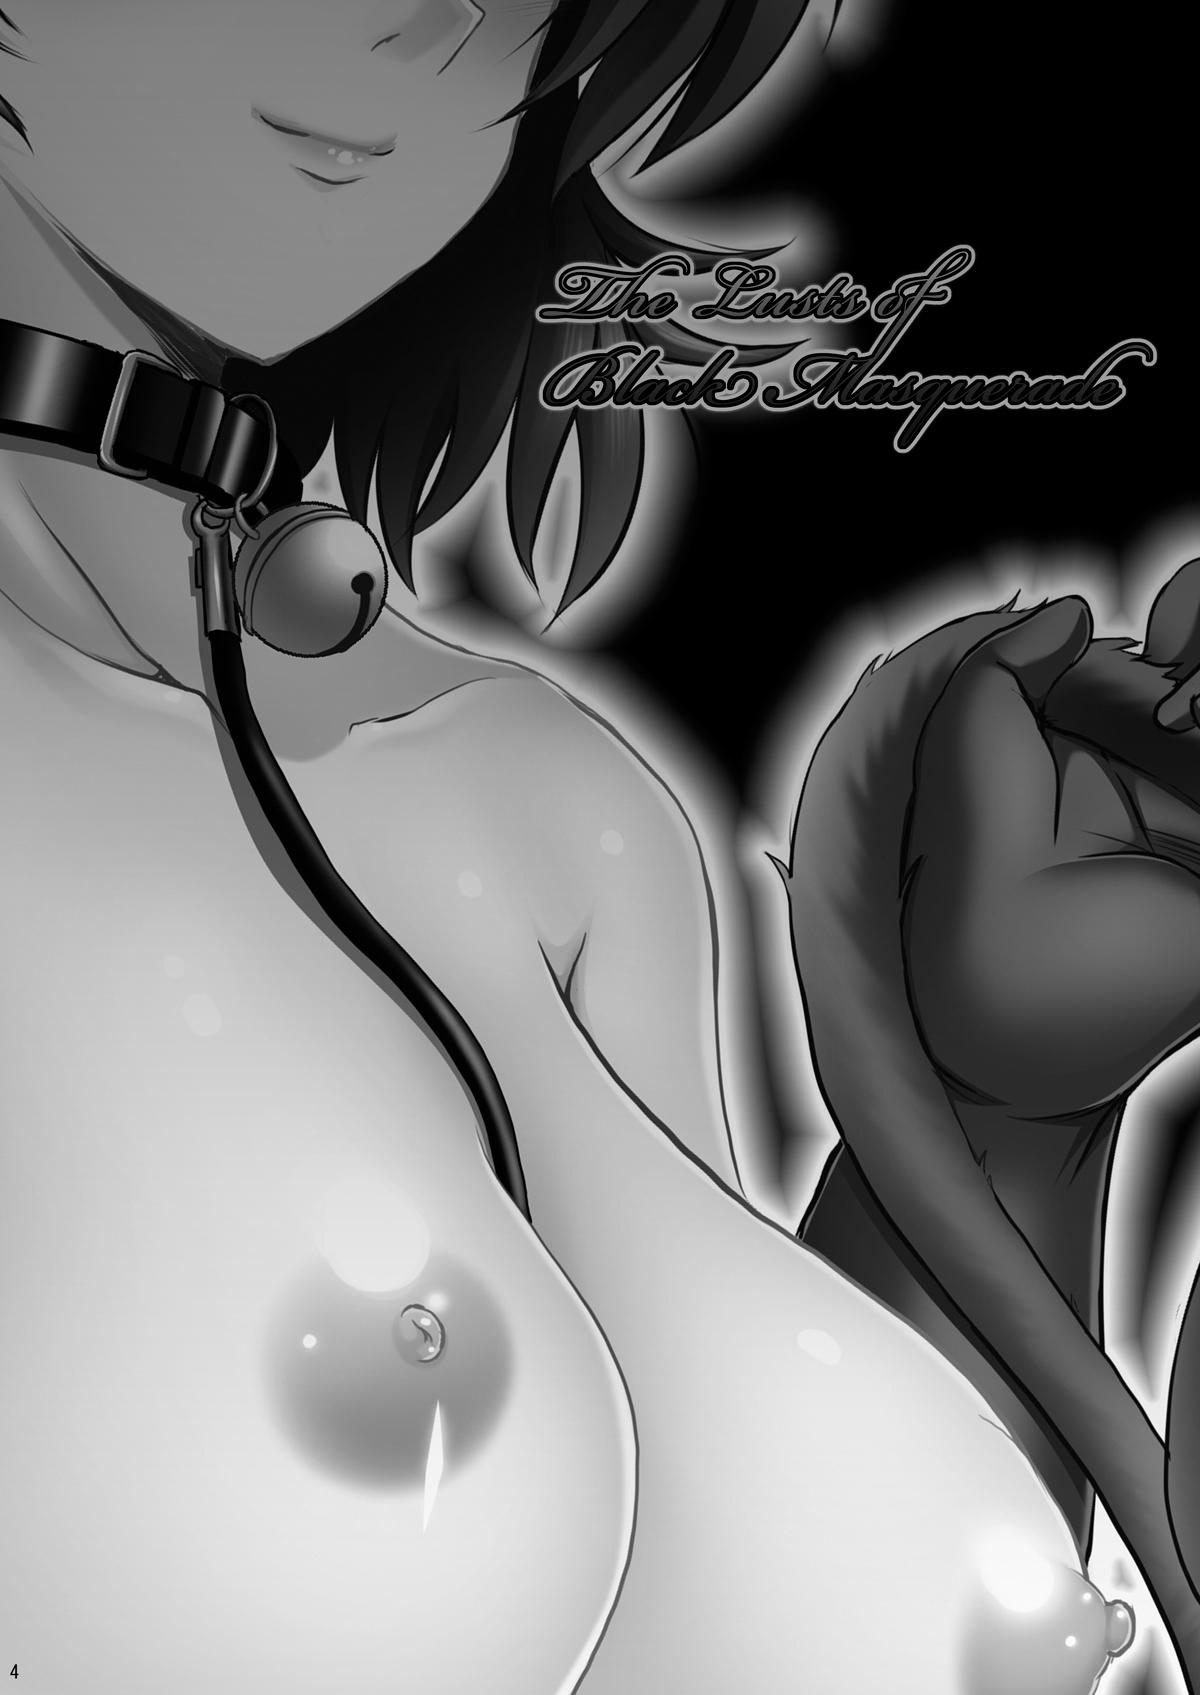 Hình ảnh  in The Lusts of Black Masquerade